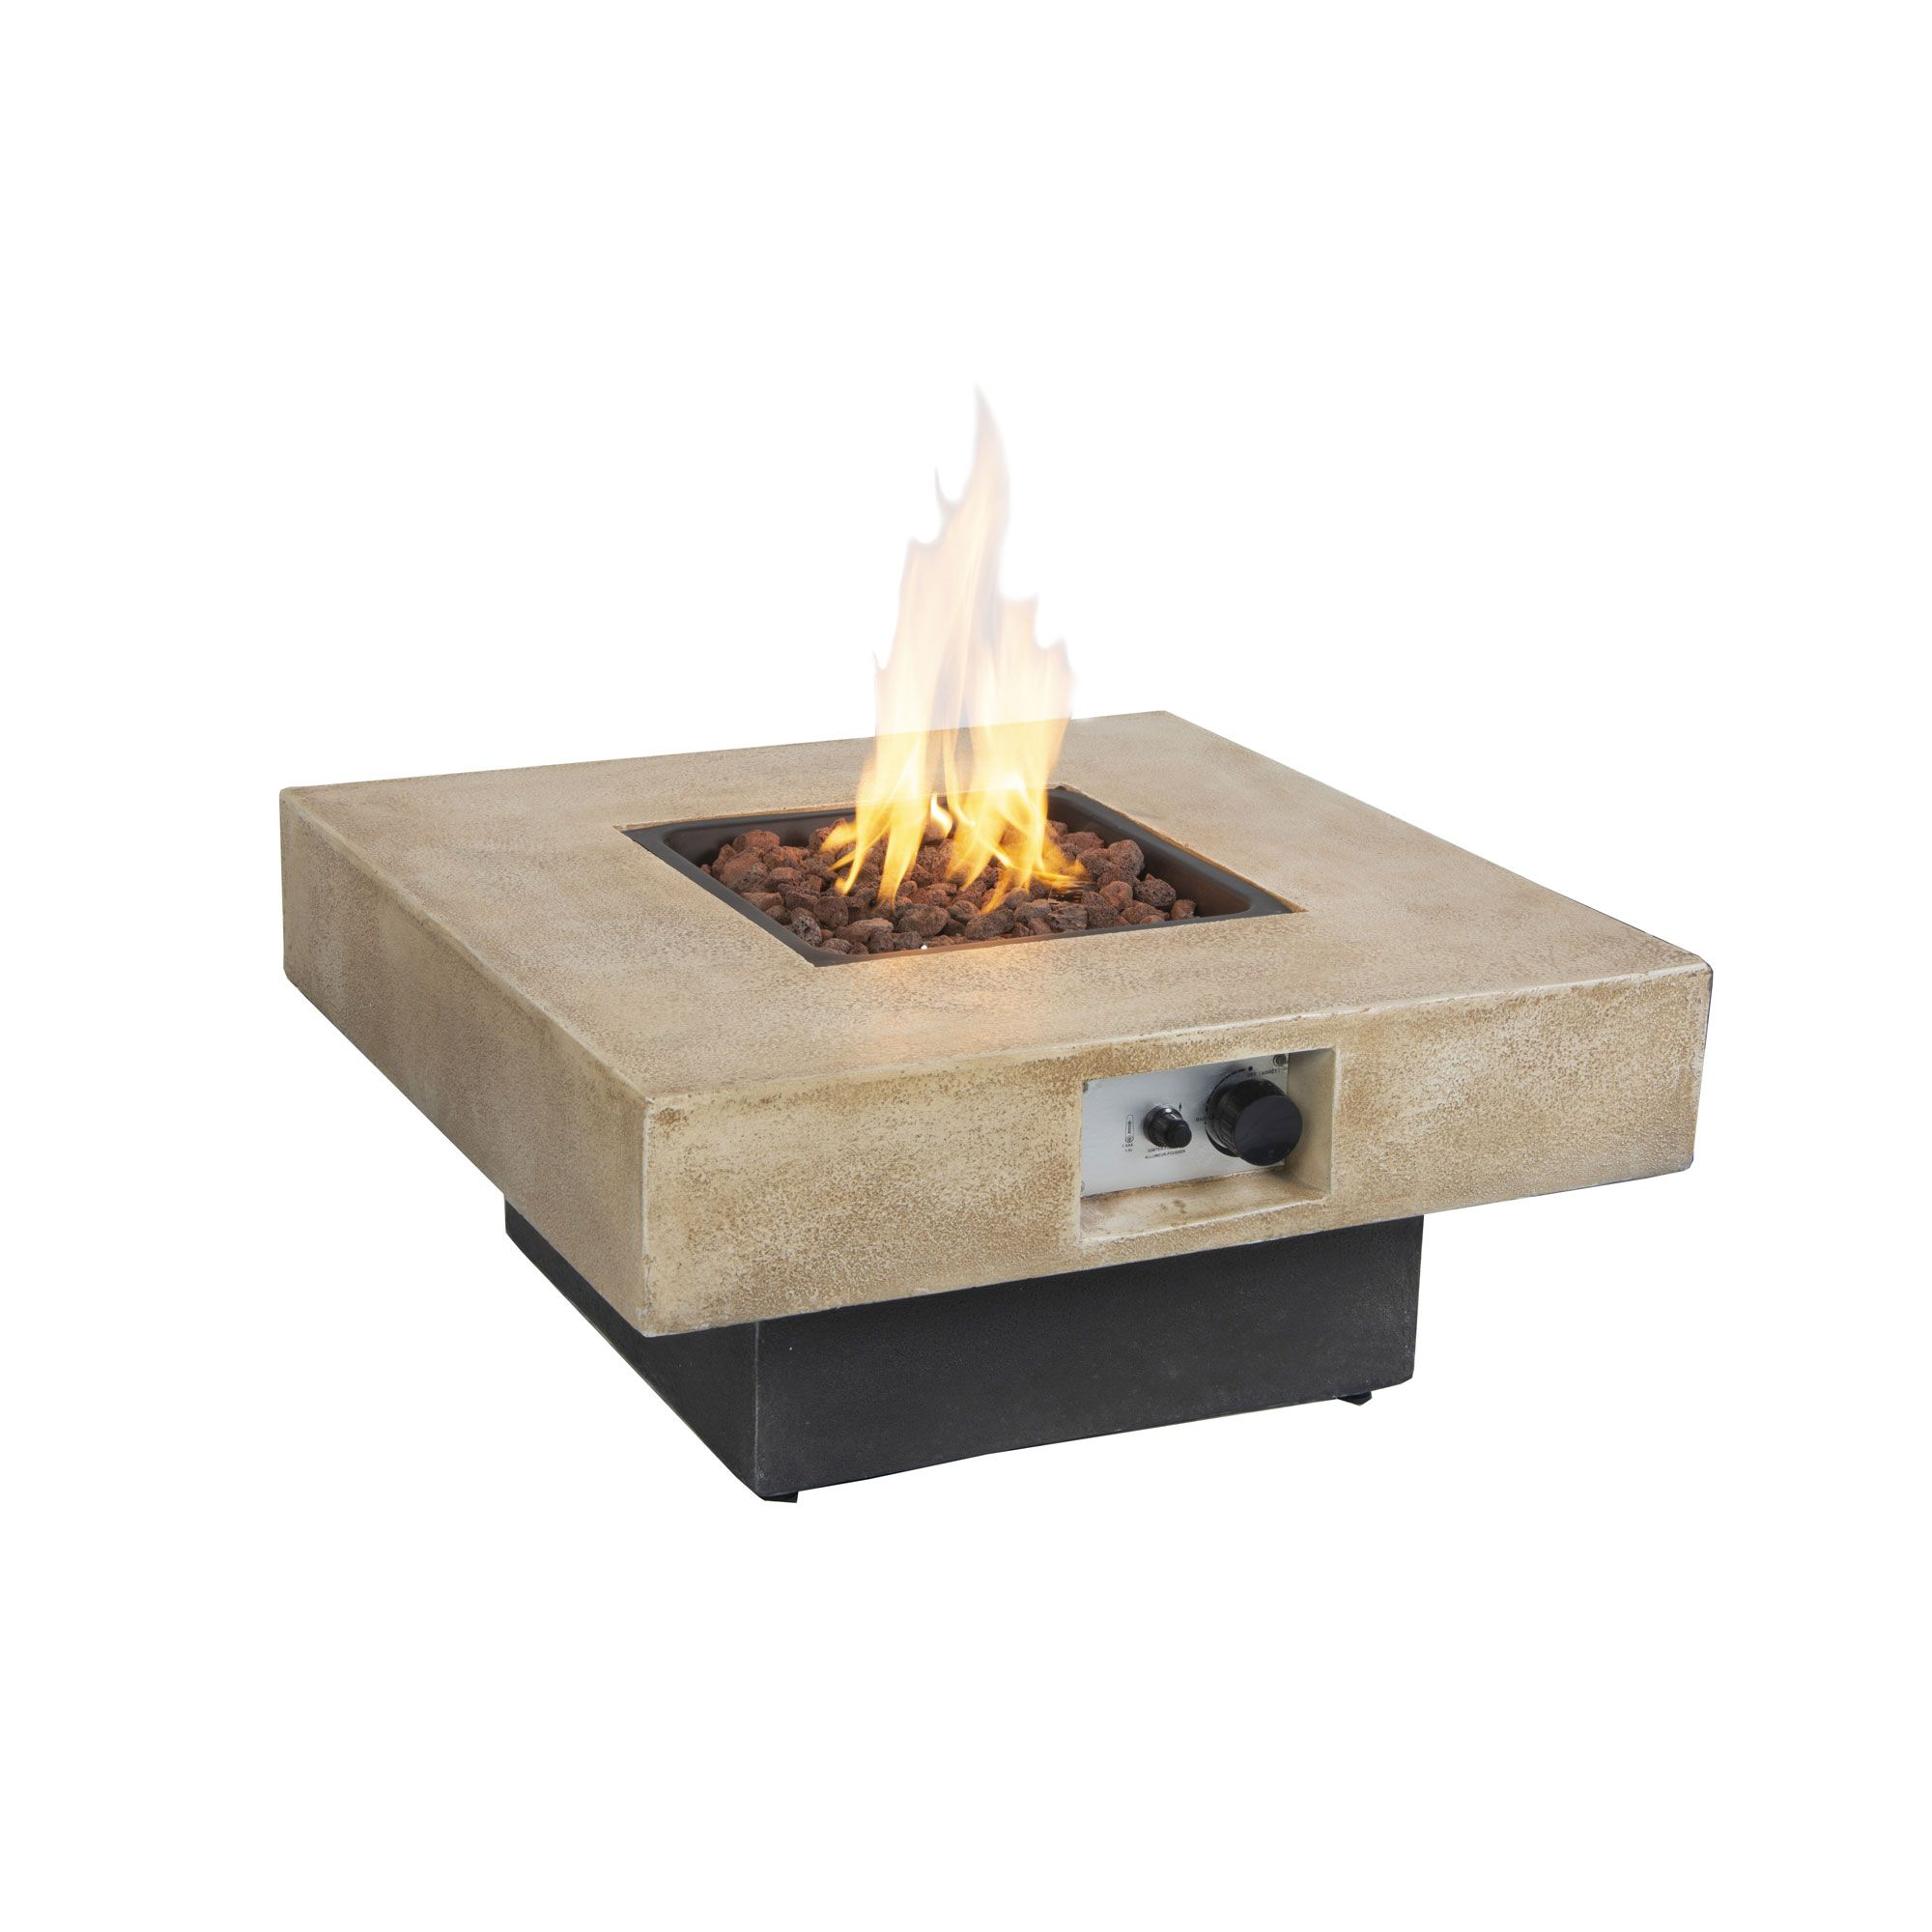 Picture of: Brayden Gas Fire Table Outdoor Heating Kent Building Supplies